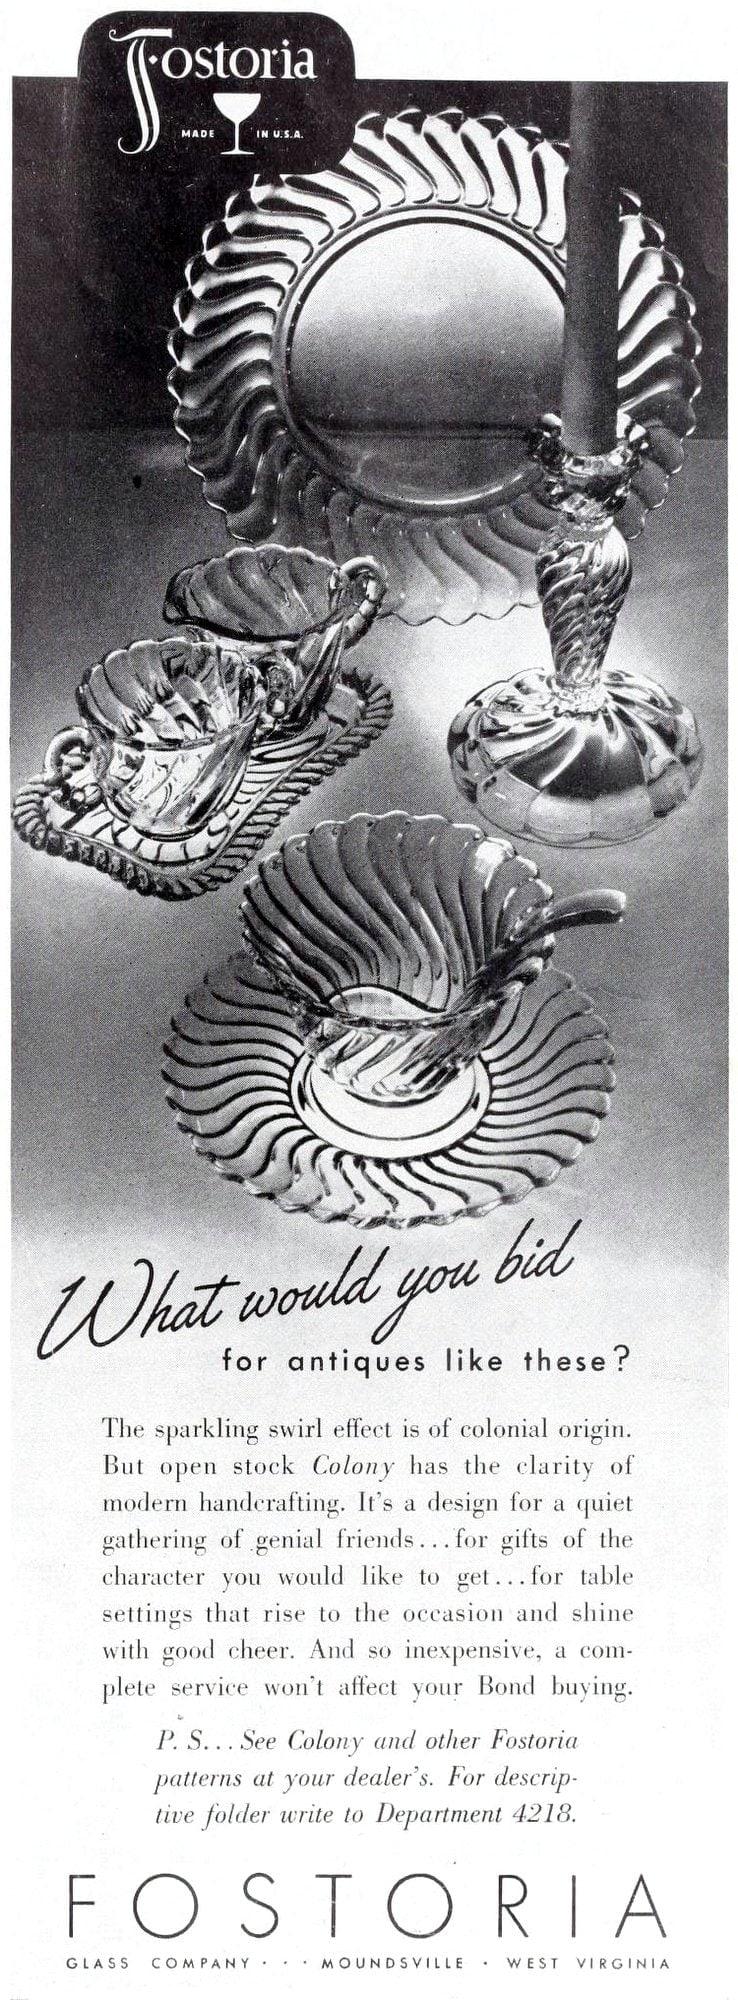 1940s Fostoria glassware from 1942 (1)